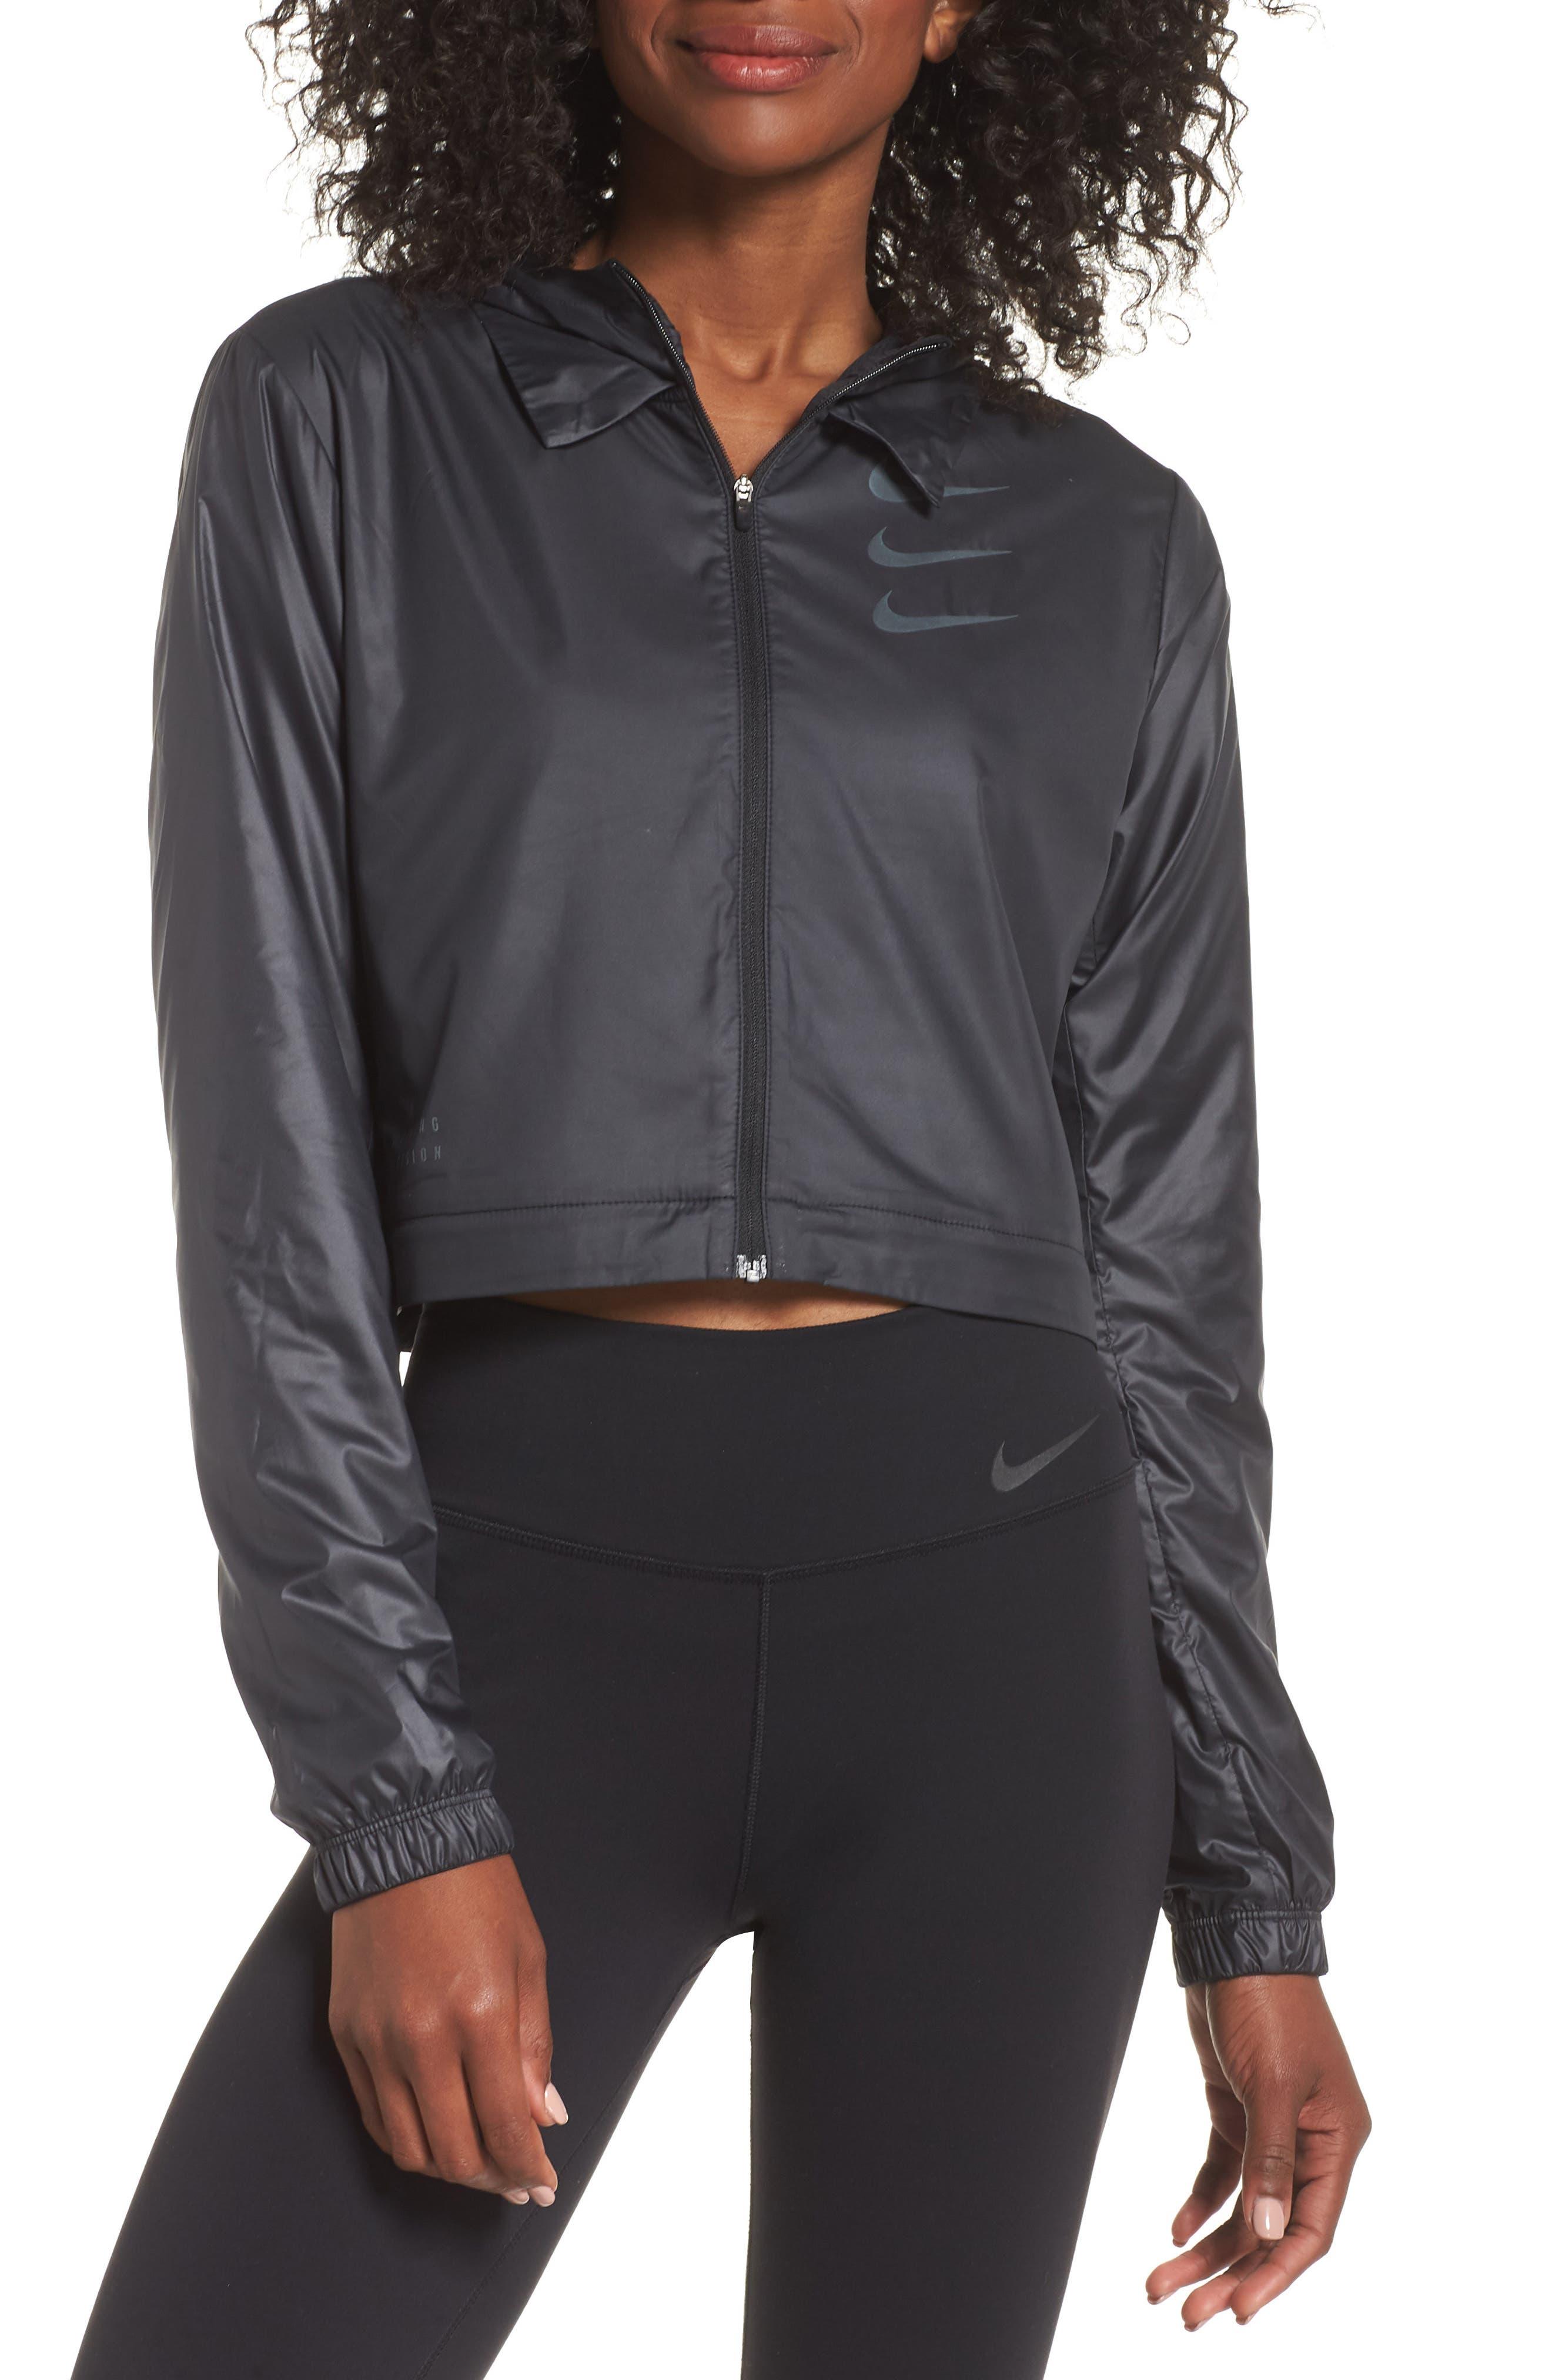 Women's Convertible Hooded Running Jacket,                             Alternate thumbnail 2, color,                             010